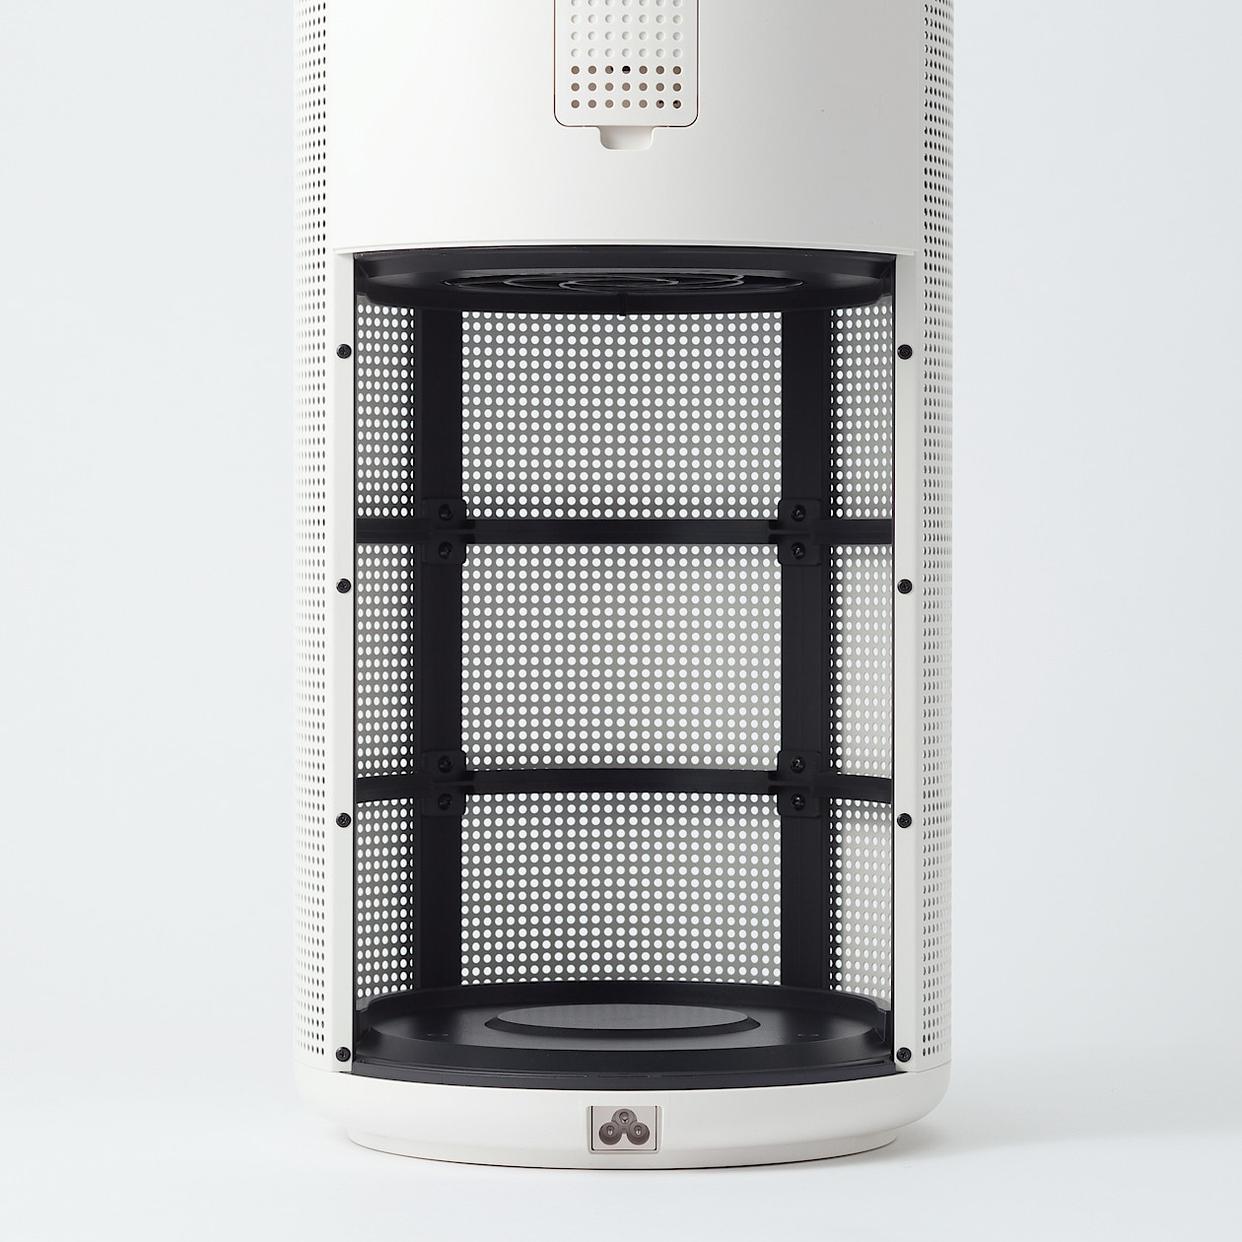 無印良品(MUJI) 空気清浄機 MJ-AP1の商品画像12